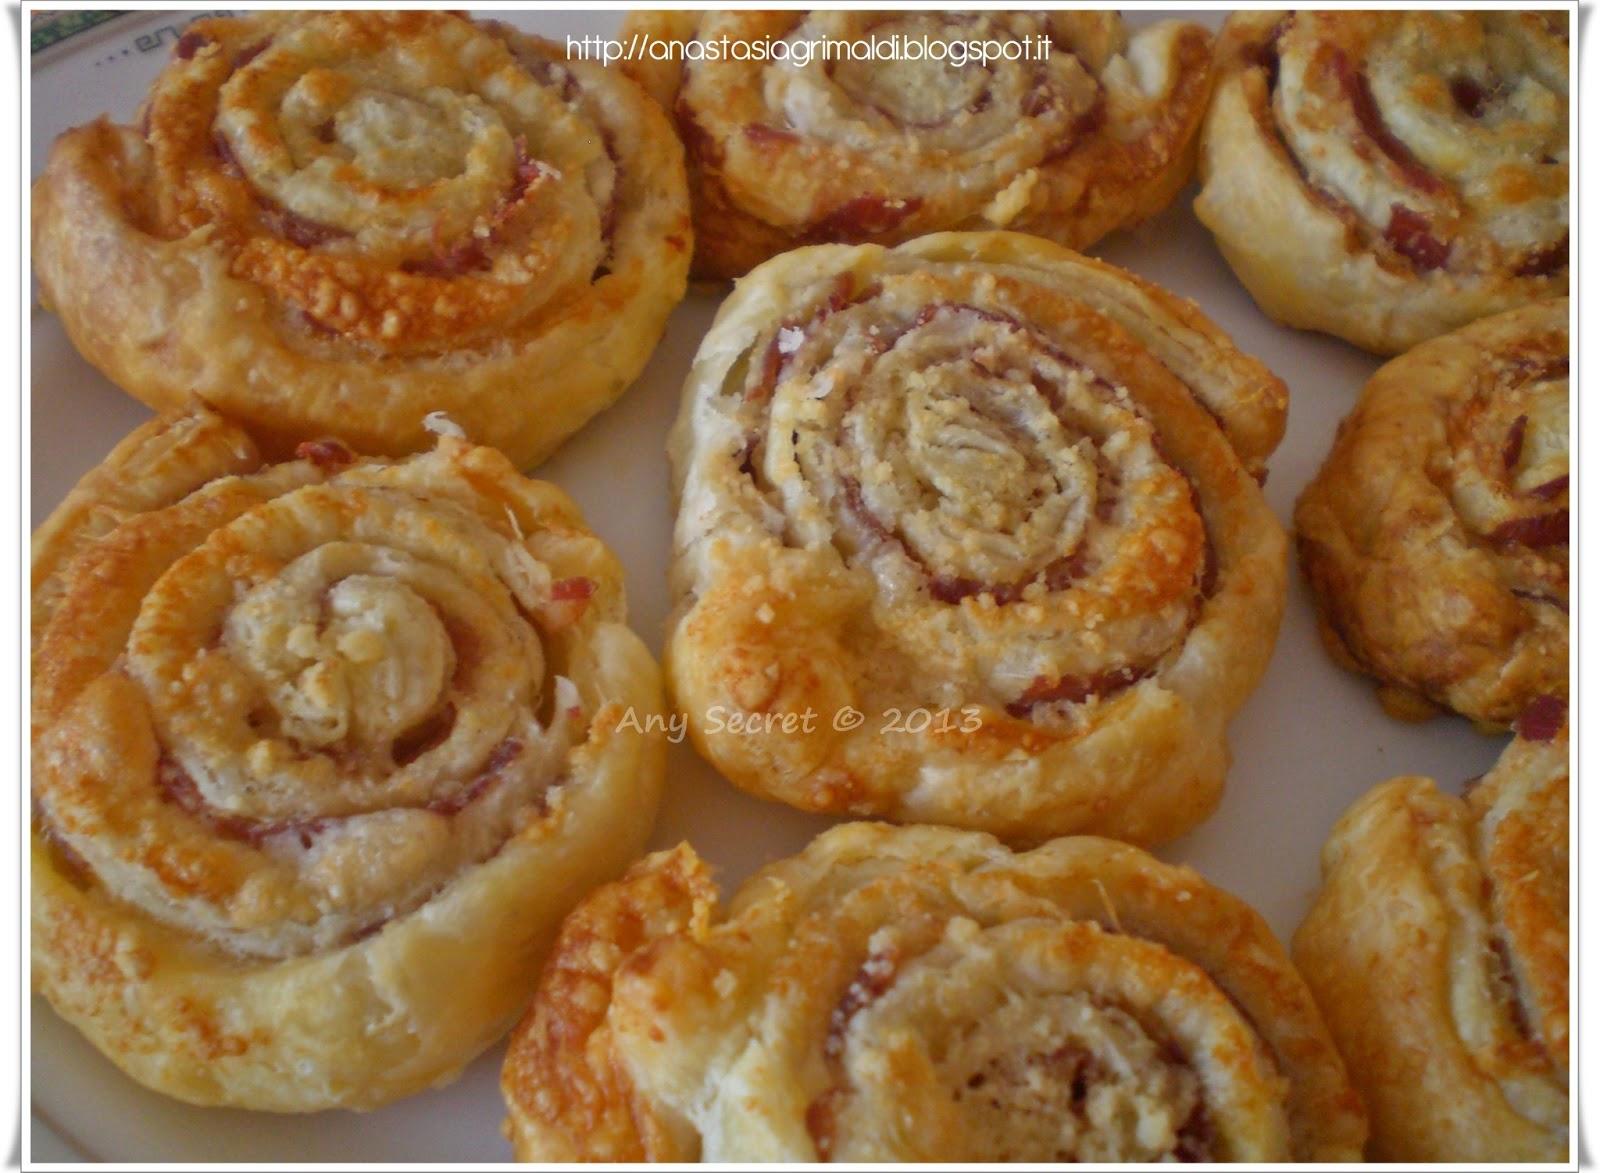 http://1.bp.blogspot.com/-mN9qZzGl6h4/UOypwnyUHdI/AAAAAAAADvg/pLbl10agM-8/s1600/salatini+girandolina+pancetta+e+pecorino.JPG